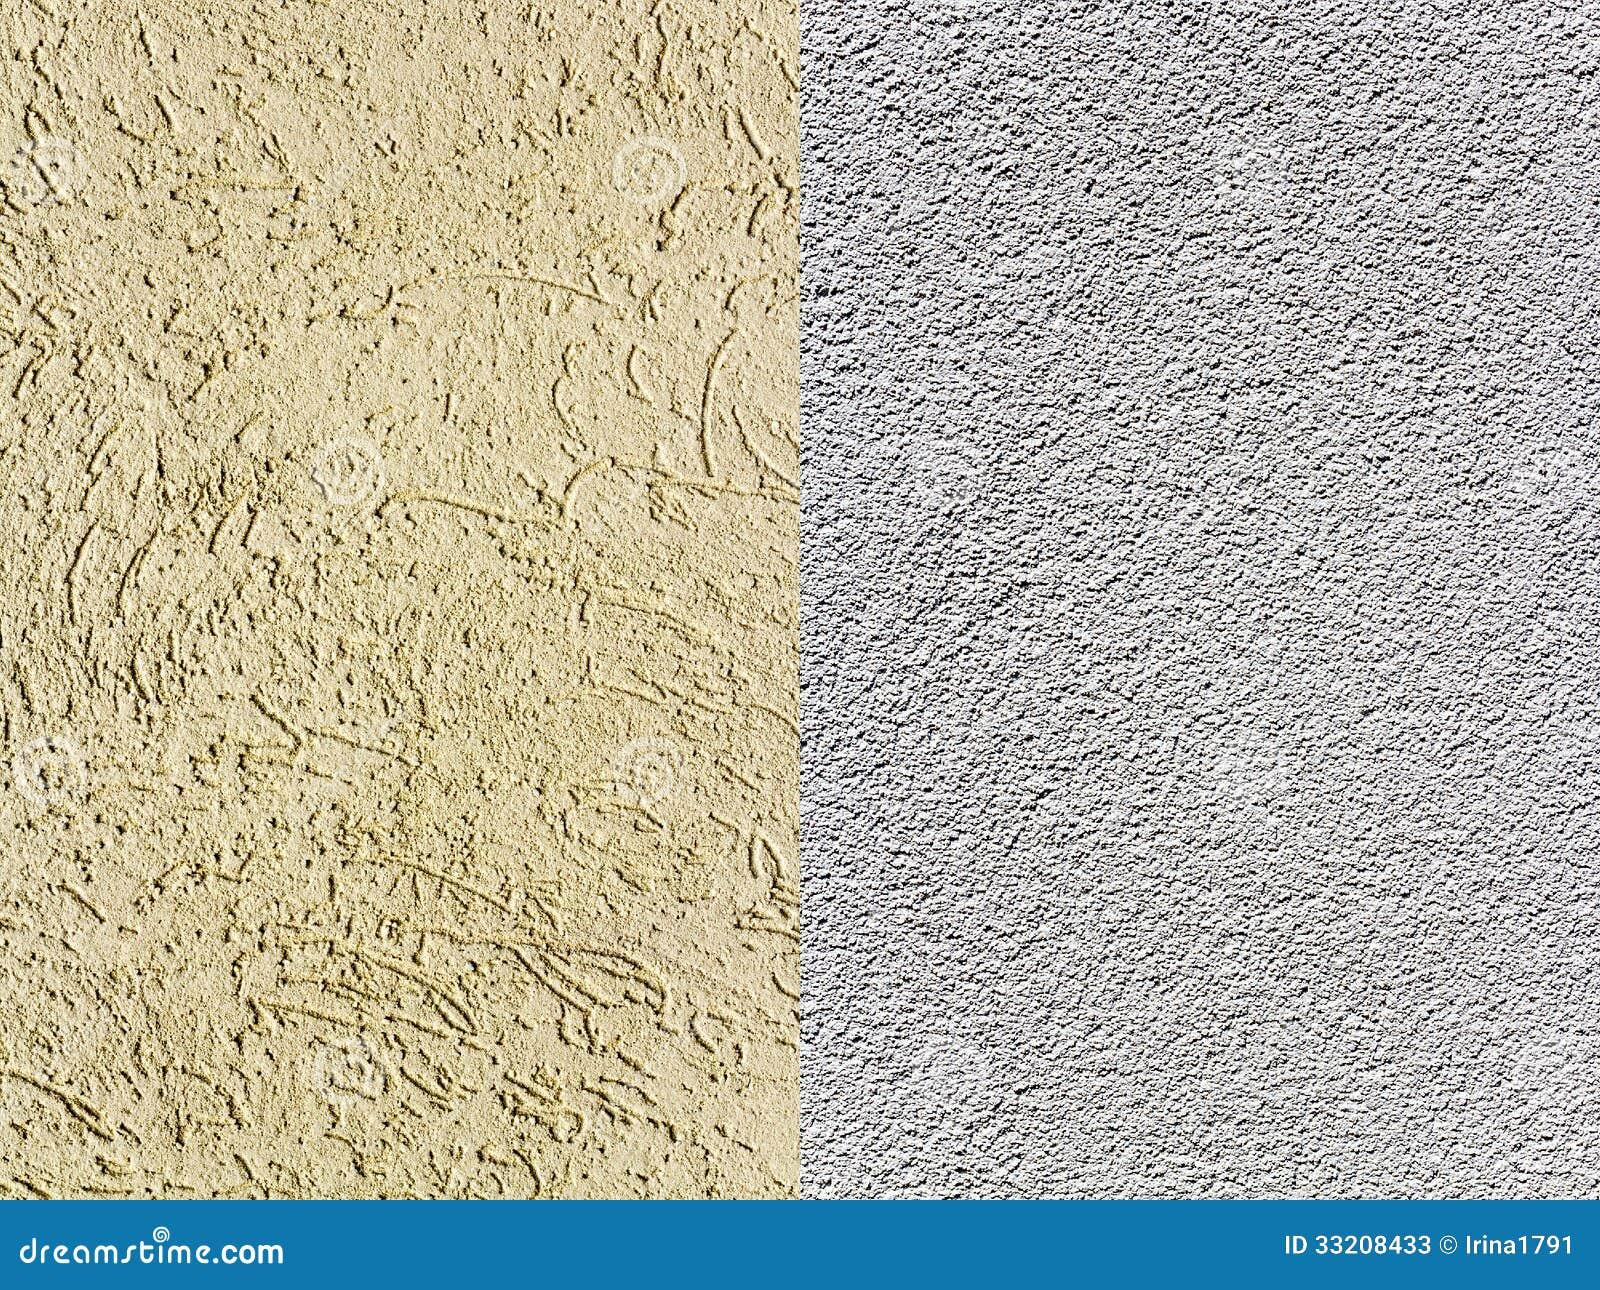 Textured plaster